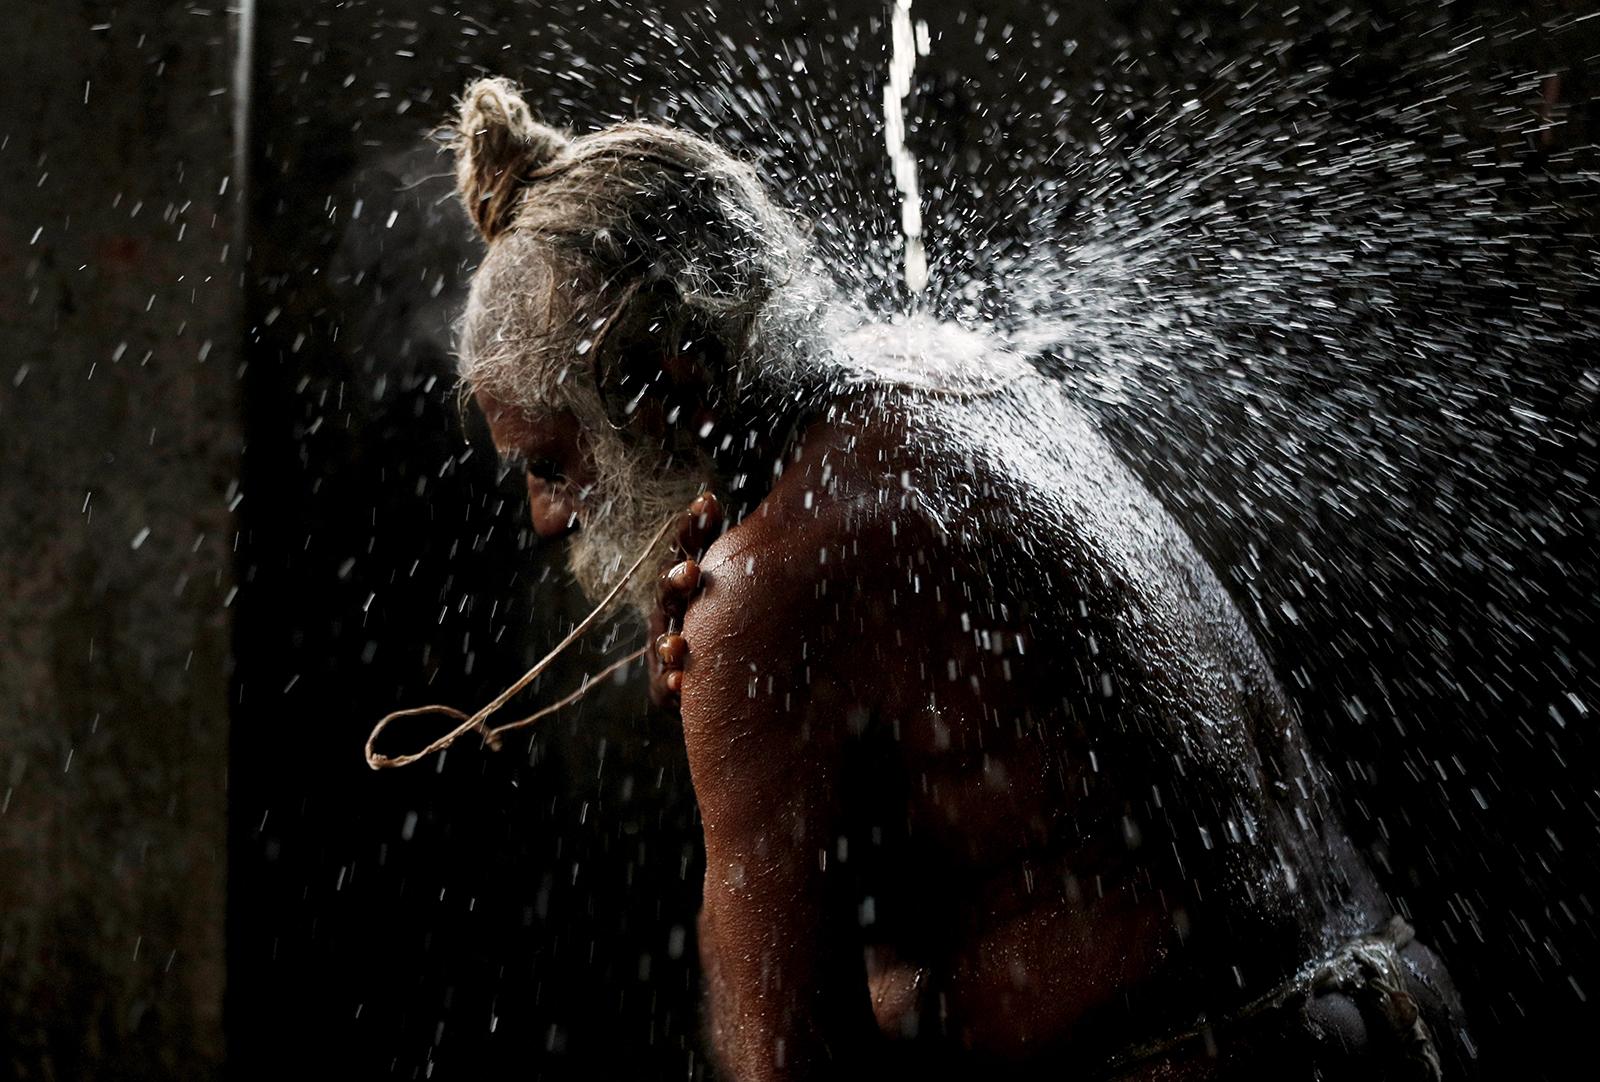 A Hindu holy man takes a holy bath before praying during Shivratri festival on the Pashupatinath temple premises in Kathmandu, Nepal, Thursday, March 11, 2021. Shivratri, or the night of Shiva, is dedicated to the worship of Lord Shiva, the Hindu god of death and destruction. (AP Photo/Niranjan Shrestha)